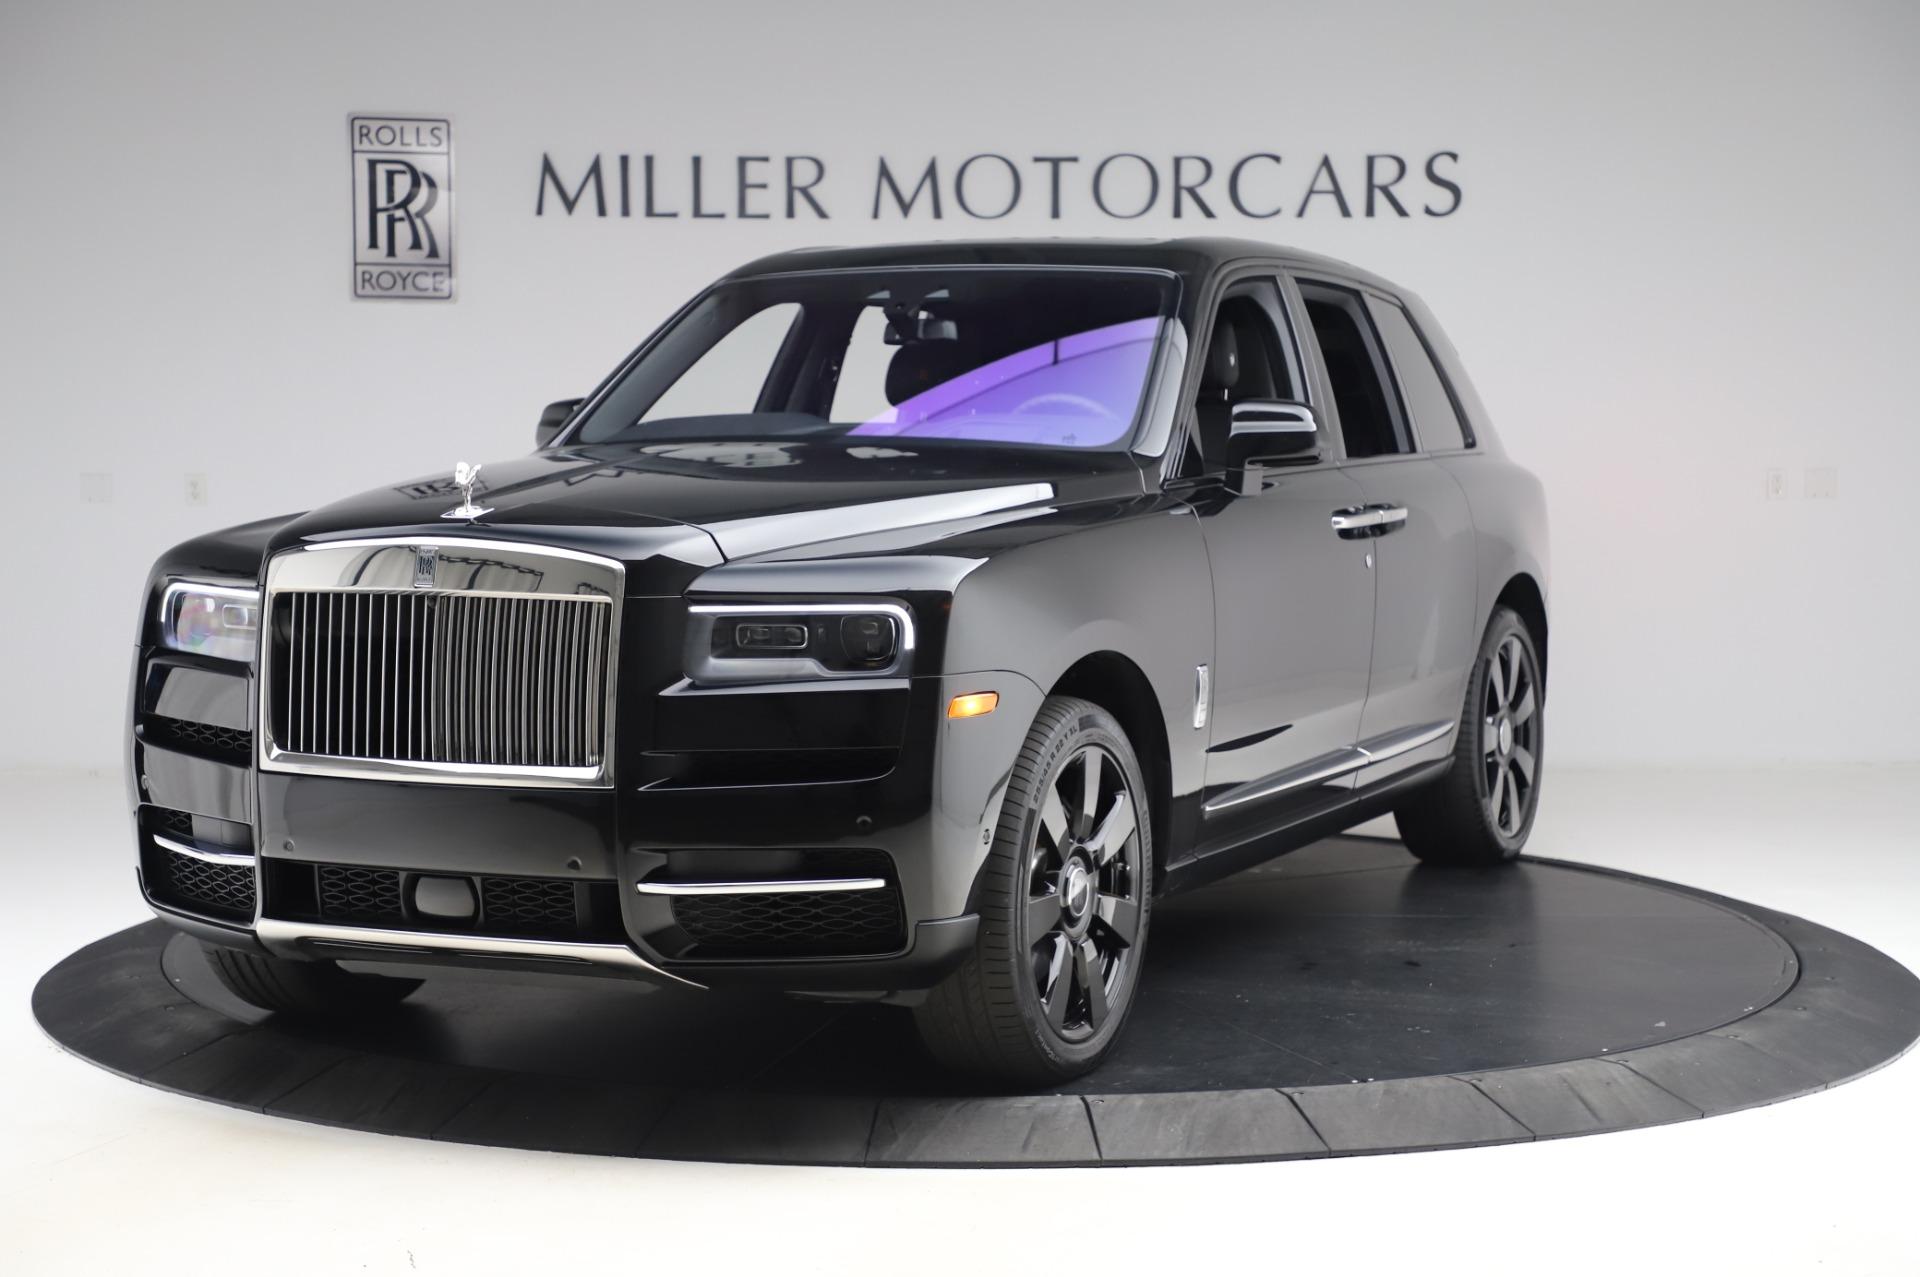 Used 2020 Rolls-Royce Cullinan for sale $355,900 at Bugatti of Greenwich in Greenwich CT 06830 1